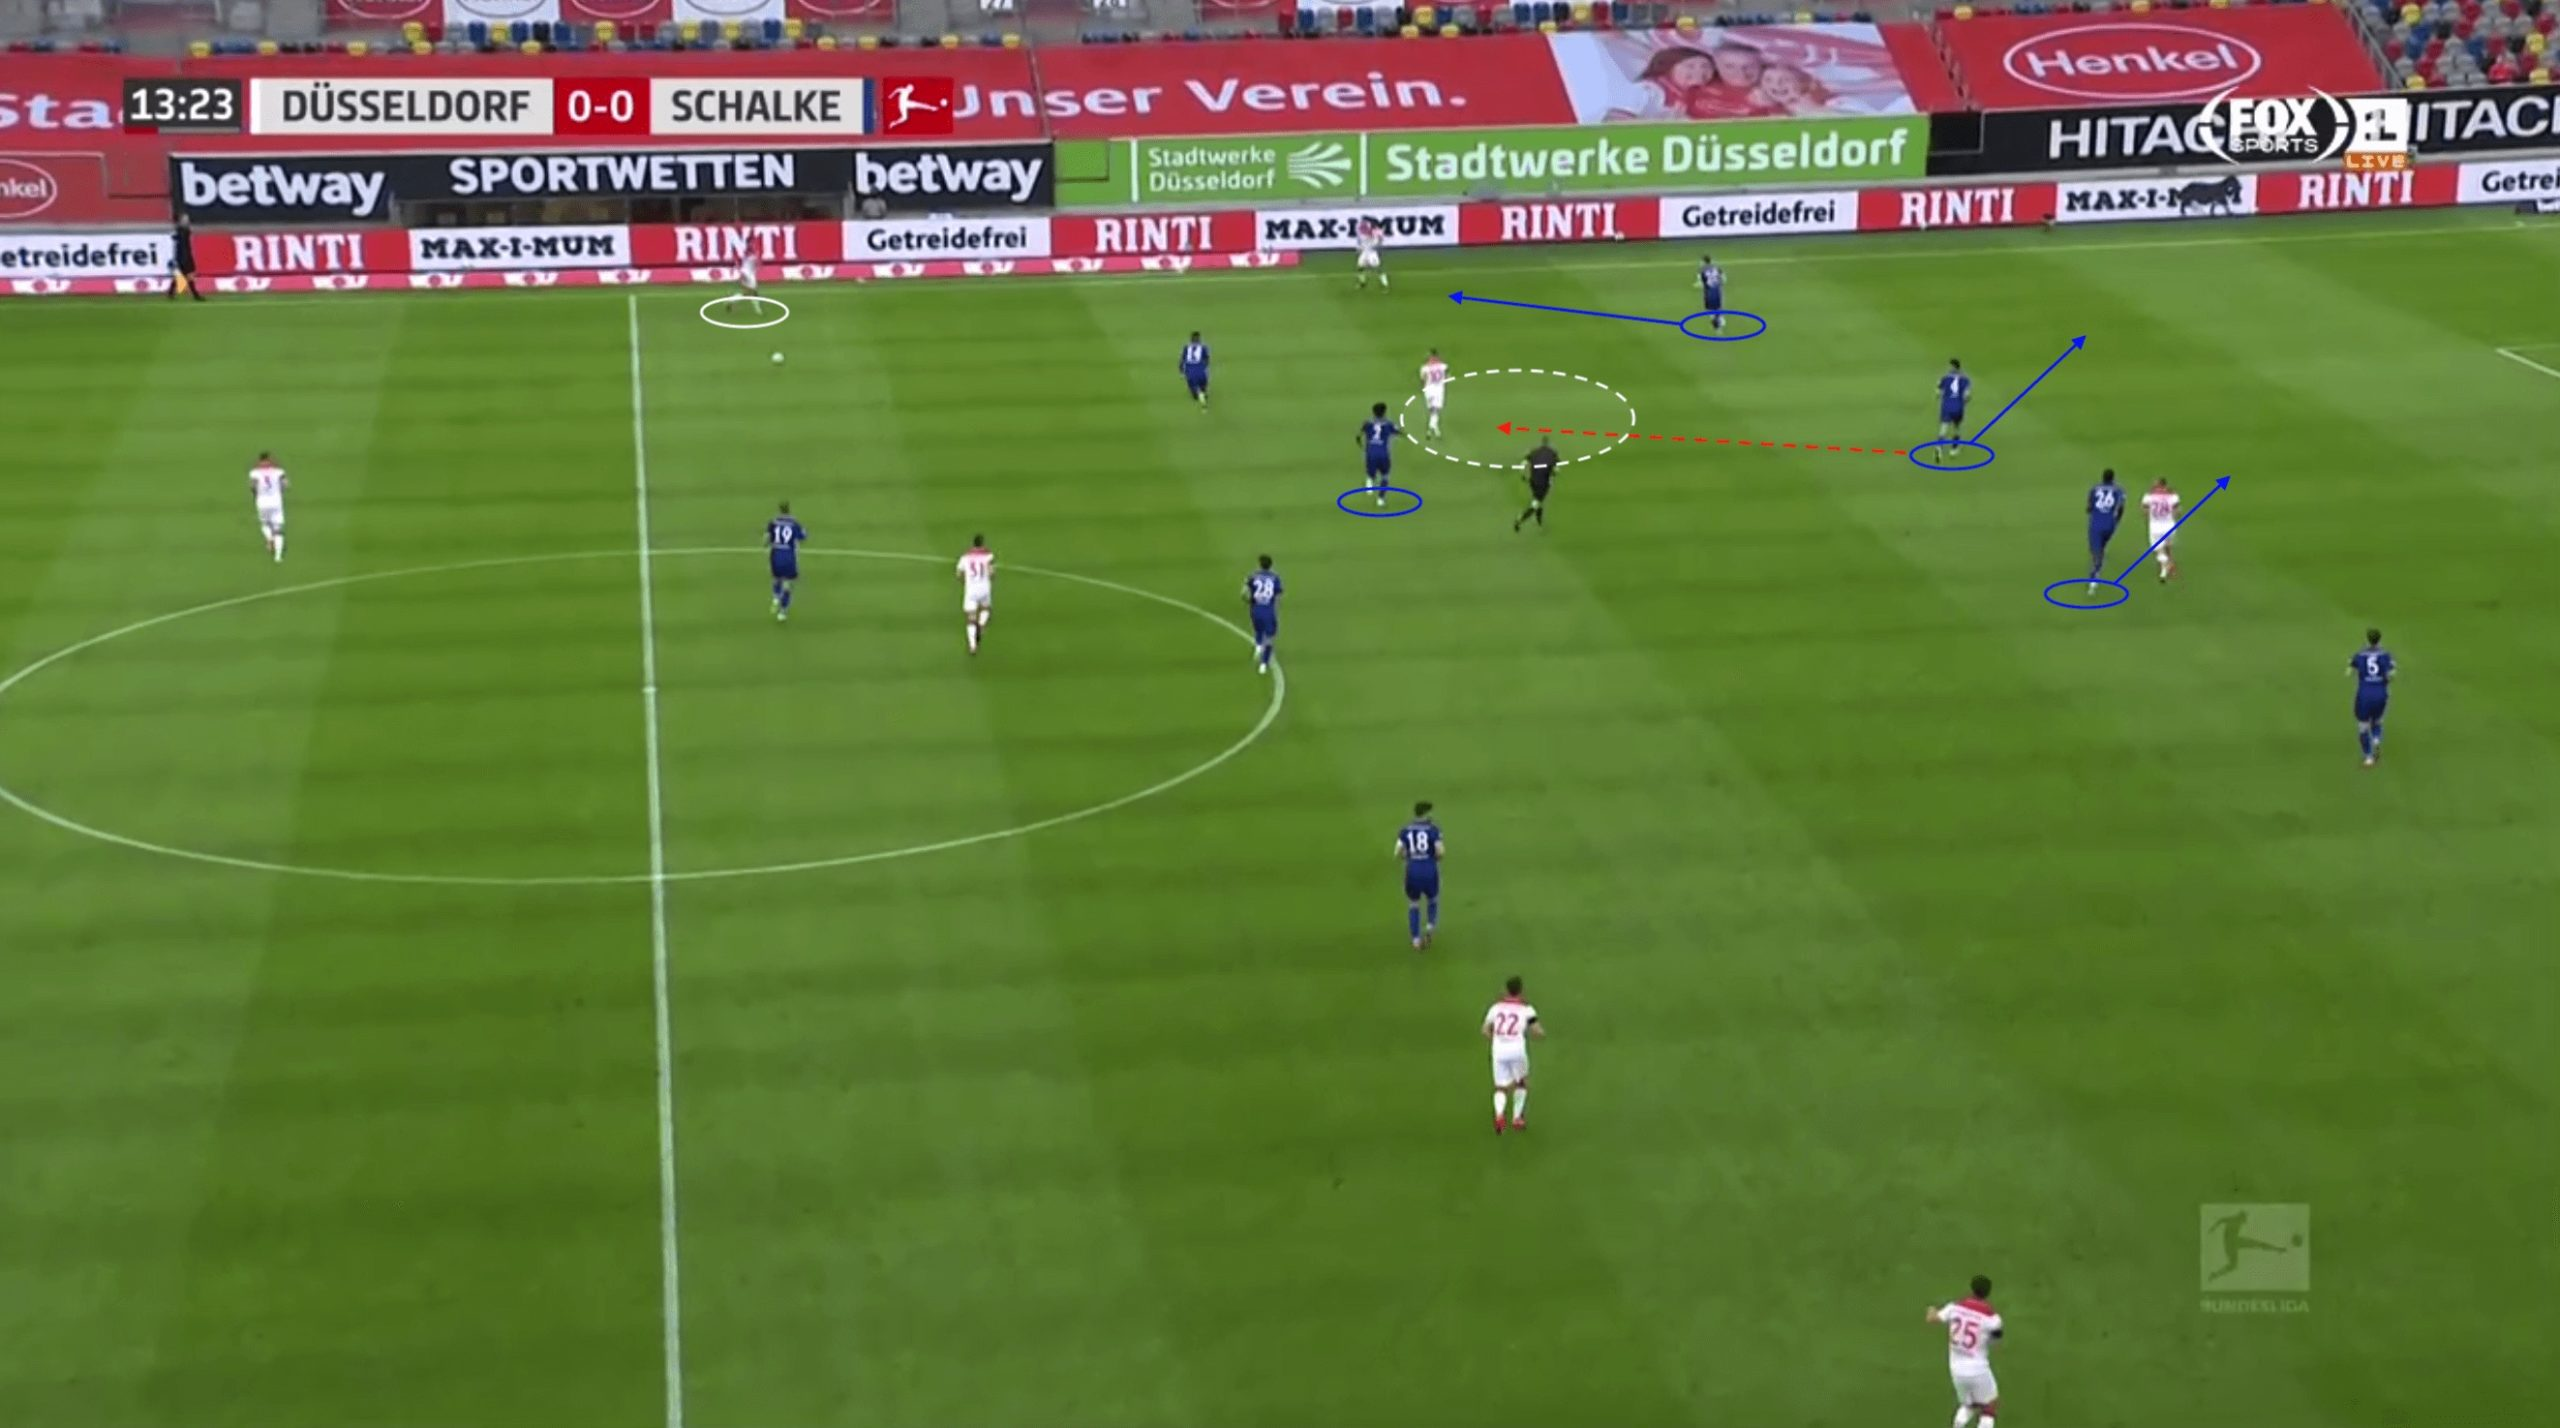 Bundesliga 2019/20: Düsseldorf vs Schalke - tactical analysis tactics